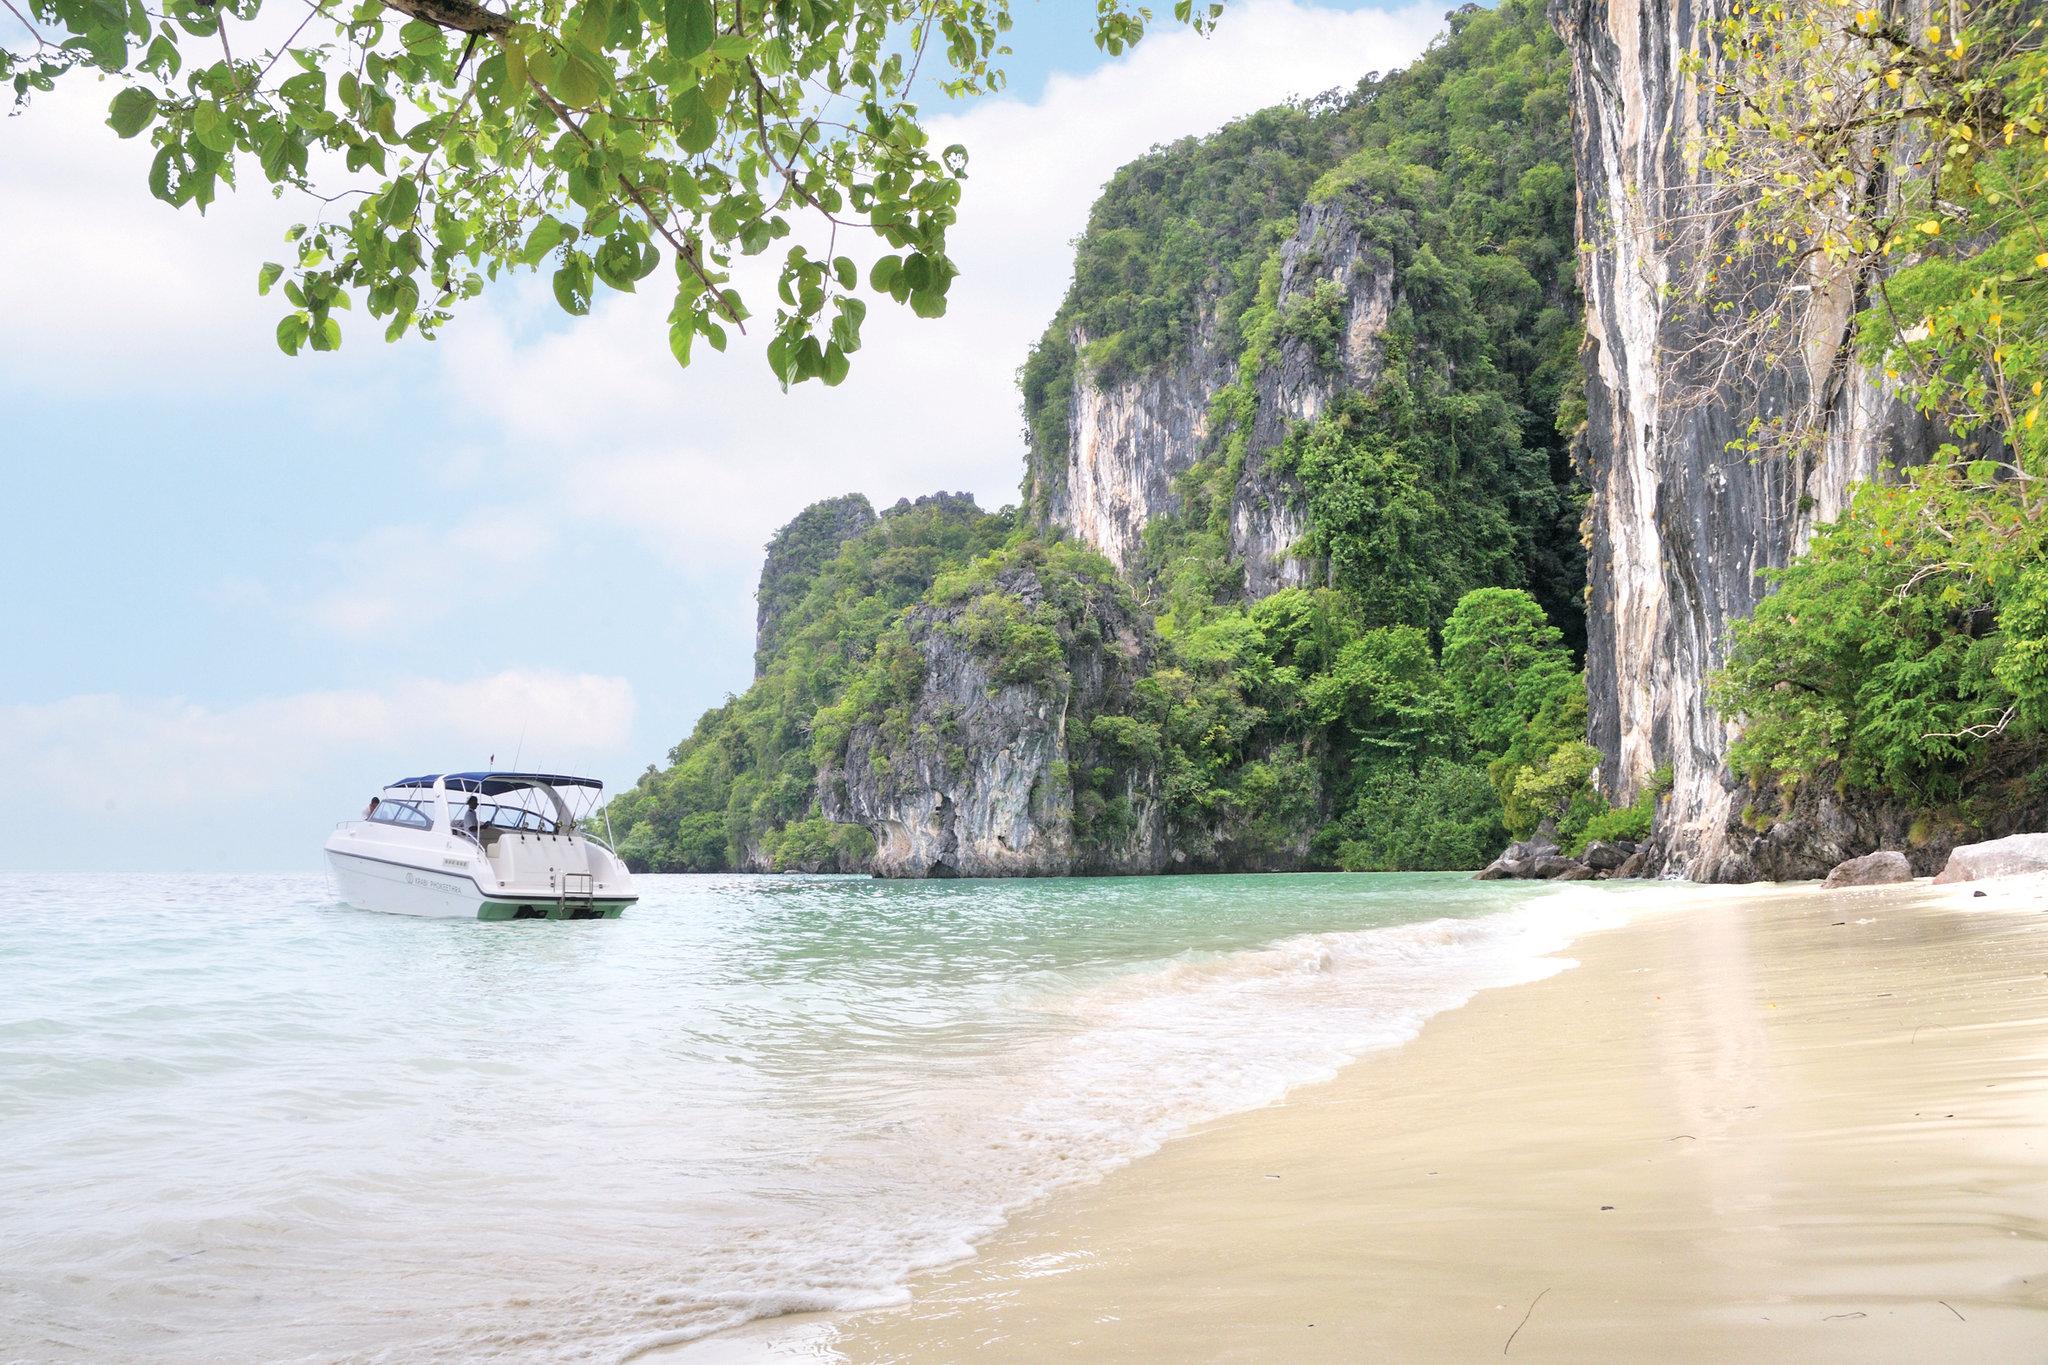 Tis' the season for tropical Thai escapes